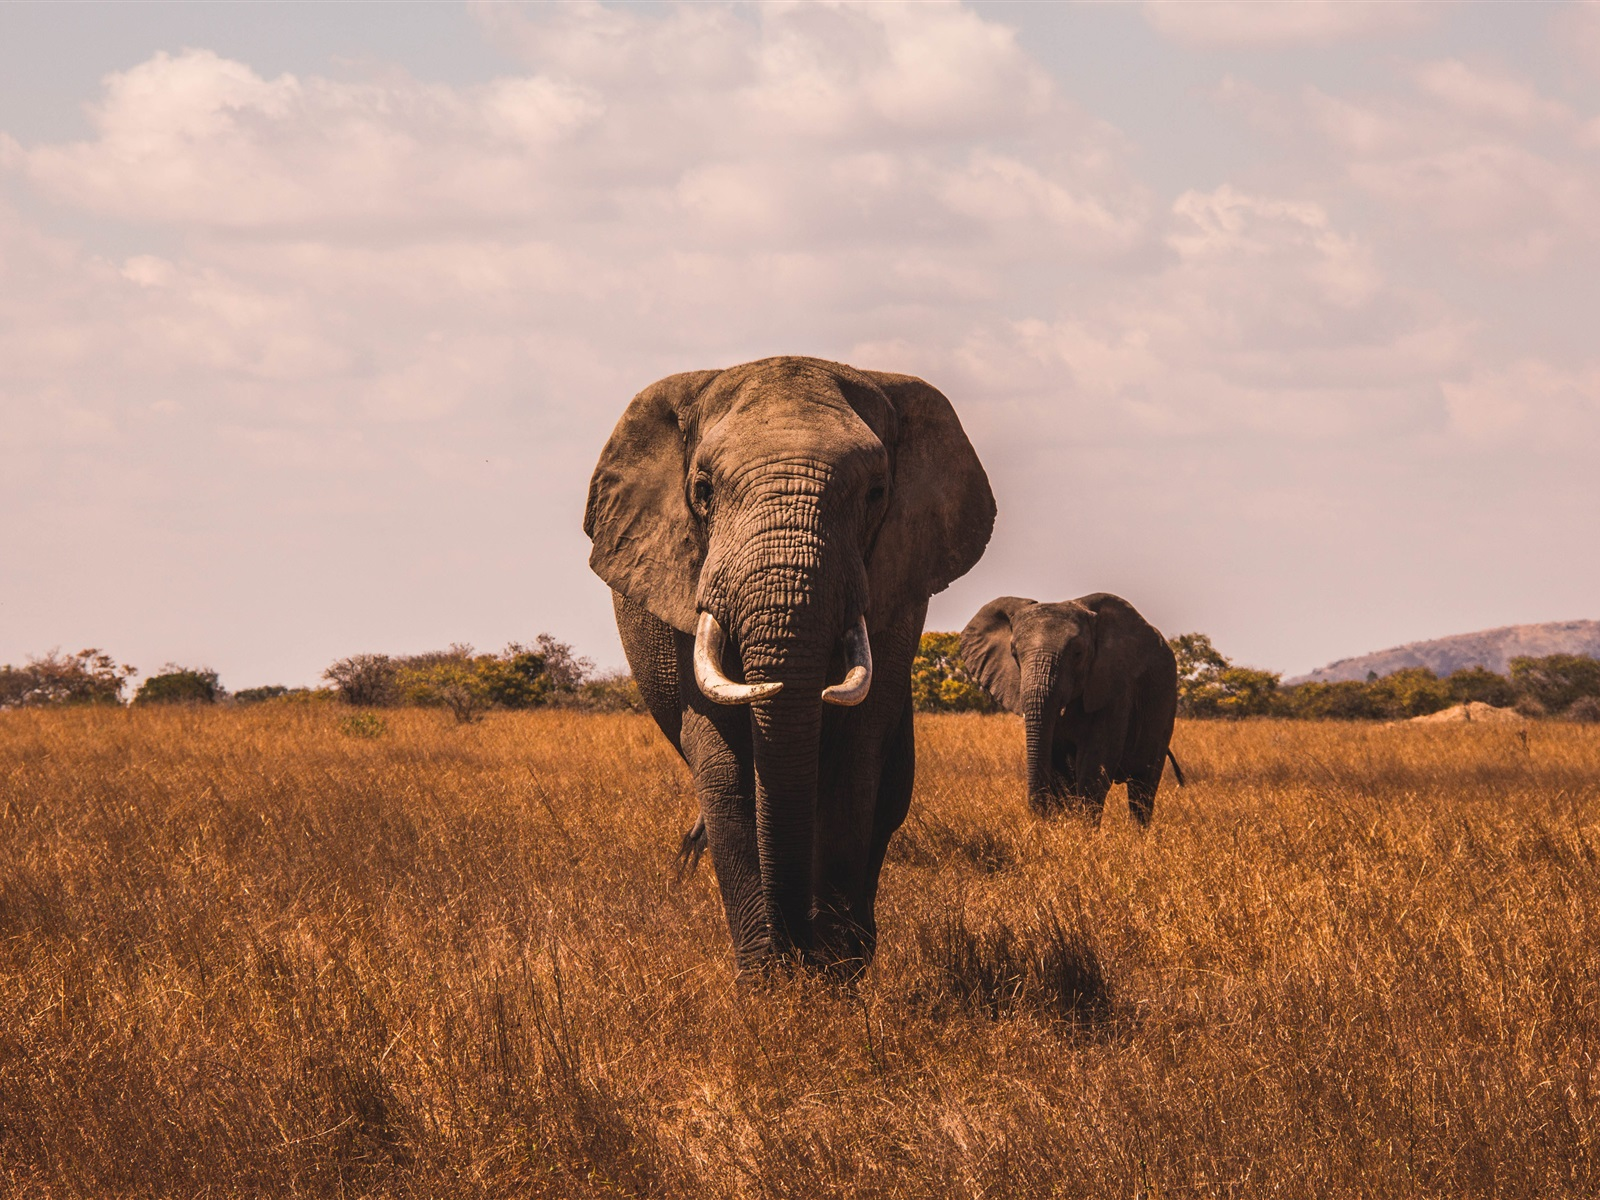 Fondos De Pantalla Iphone 7 Plus: Elefantes, Vista Frontal, Hierba 1080x1920 IPhone 8/7/6/6S